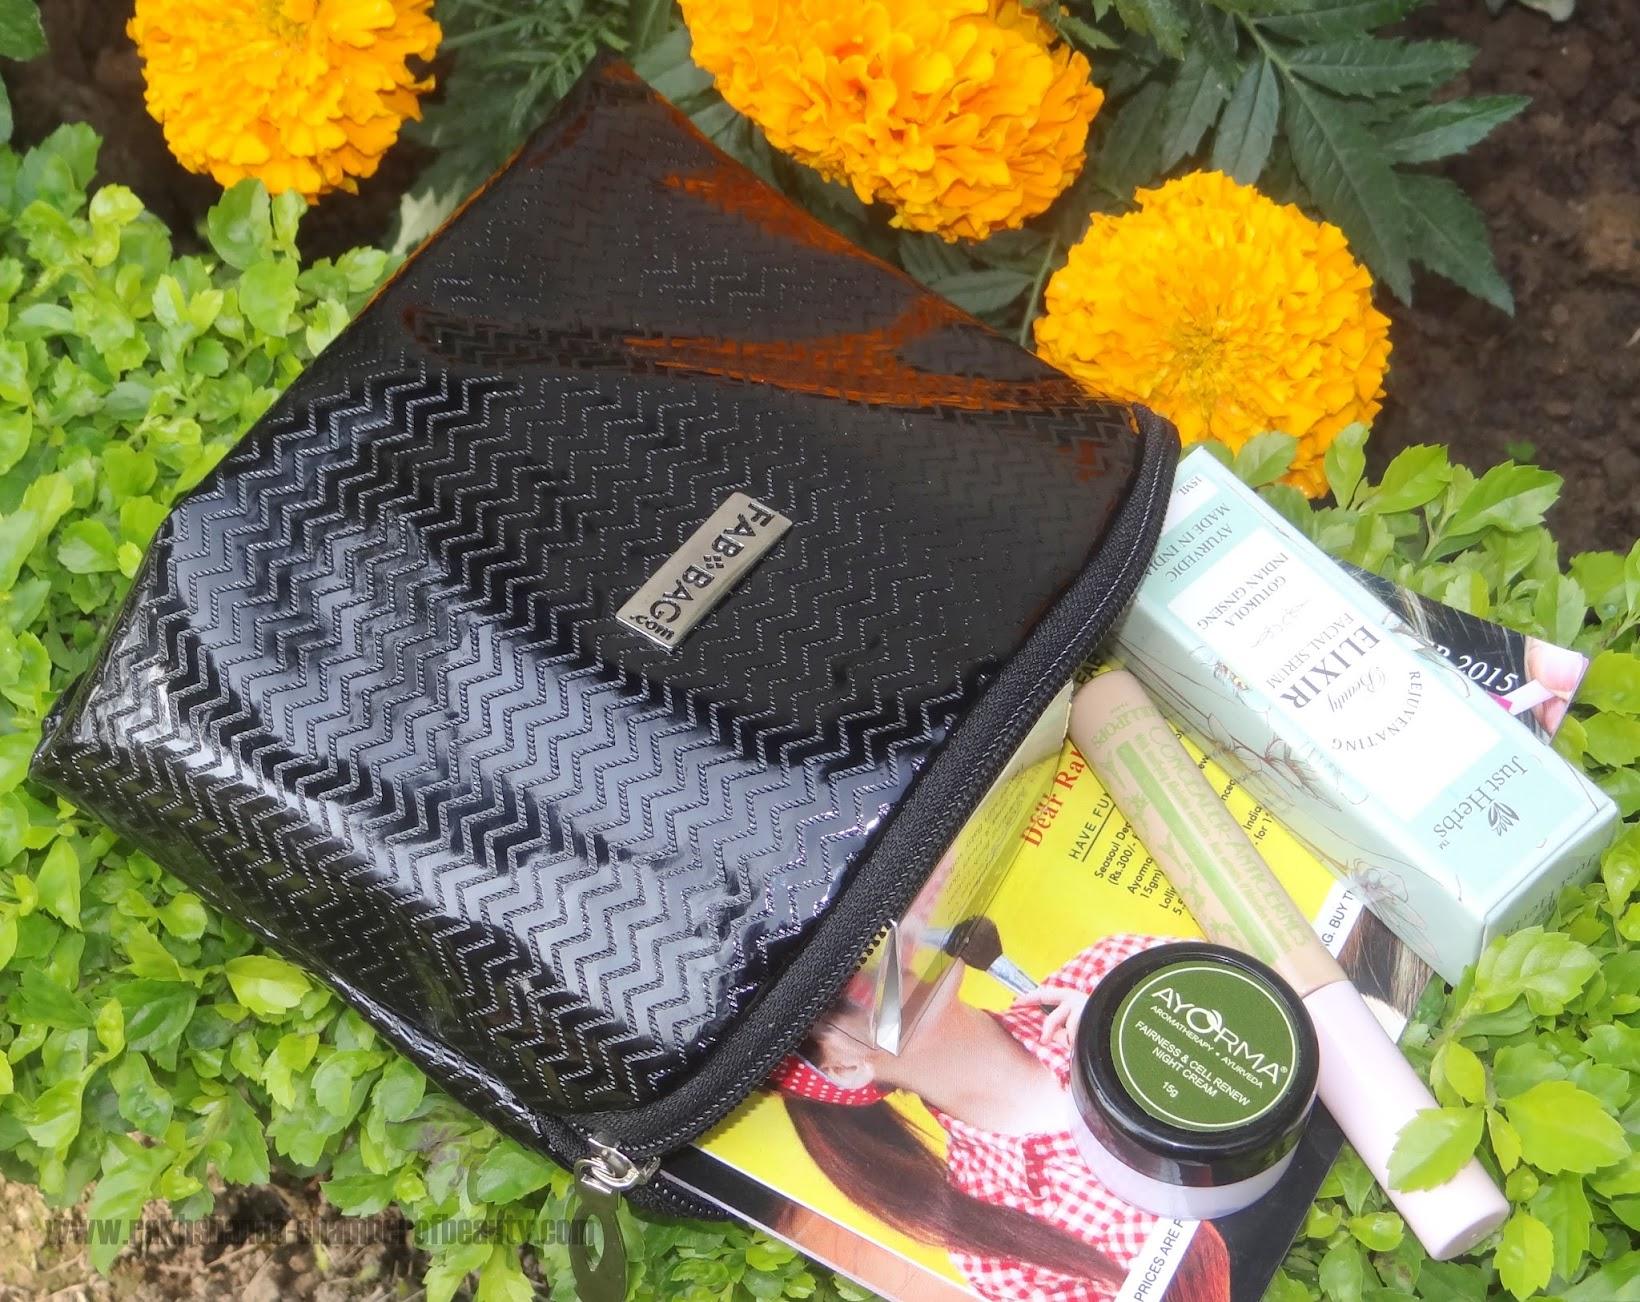 FAB BAG November 2015- Review, Fab Bag review, Indian beauty blogger